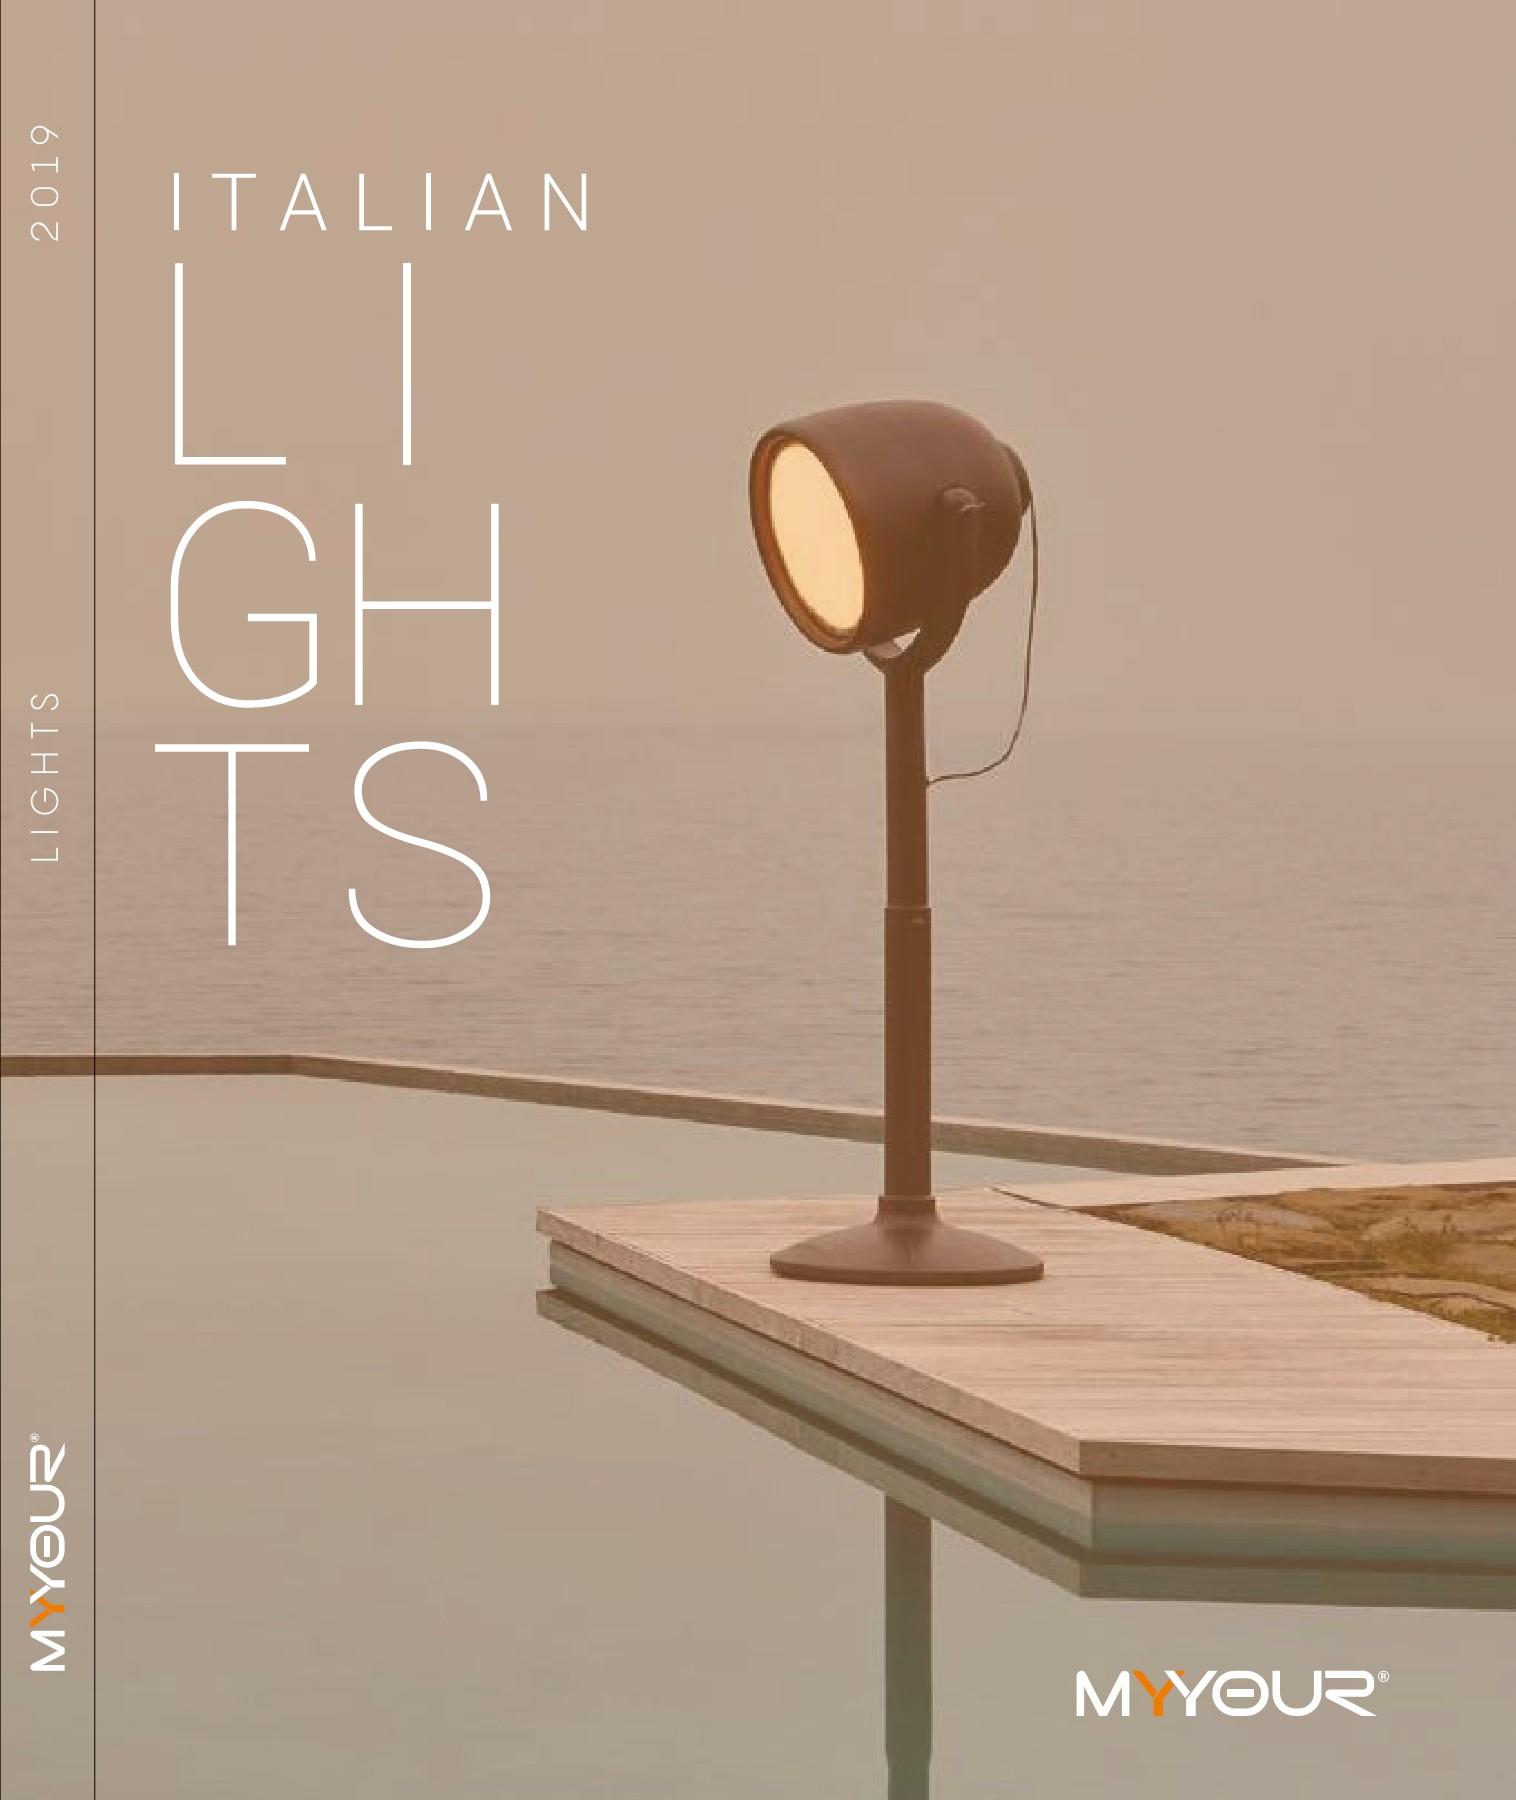 Ovvio Tavoli Da Giardino.Myyour 2019 Lights Flip Book Pages 1 50 Pubhtml5